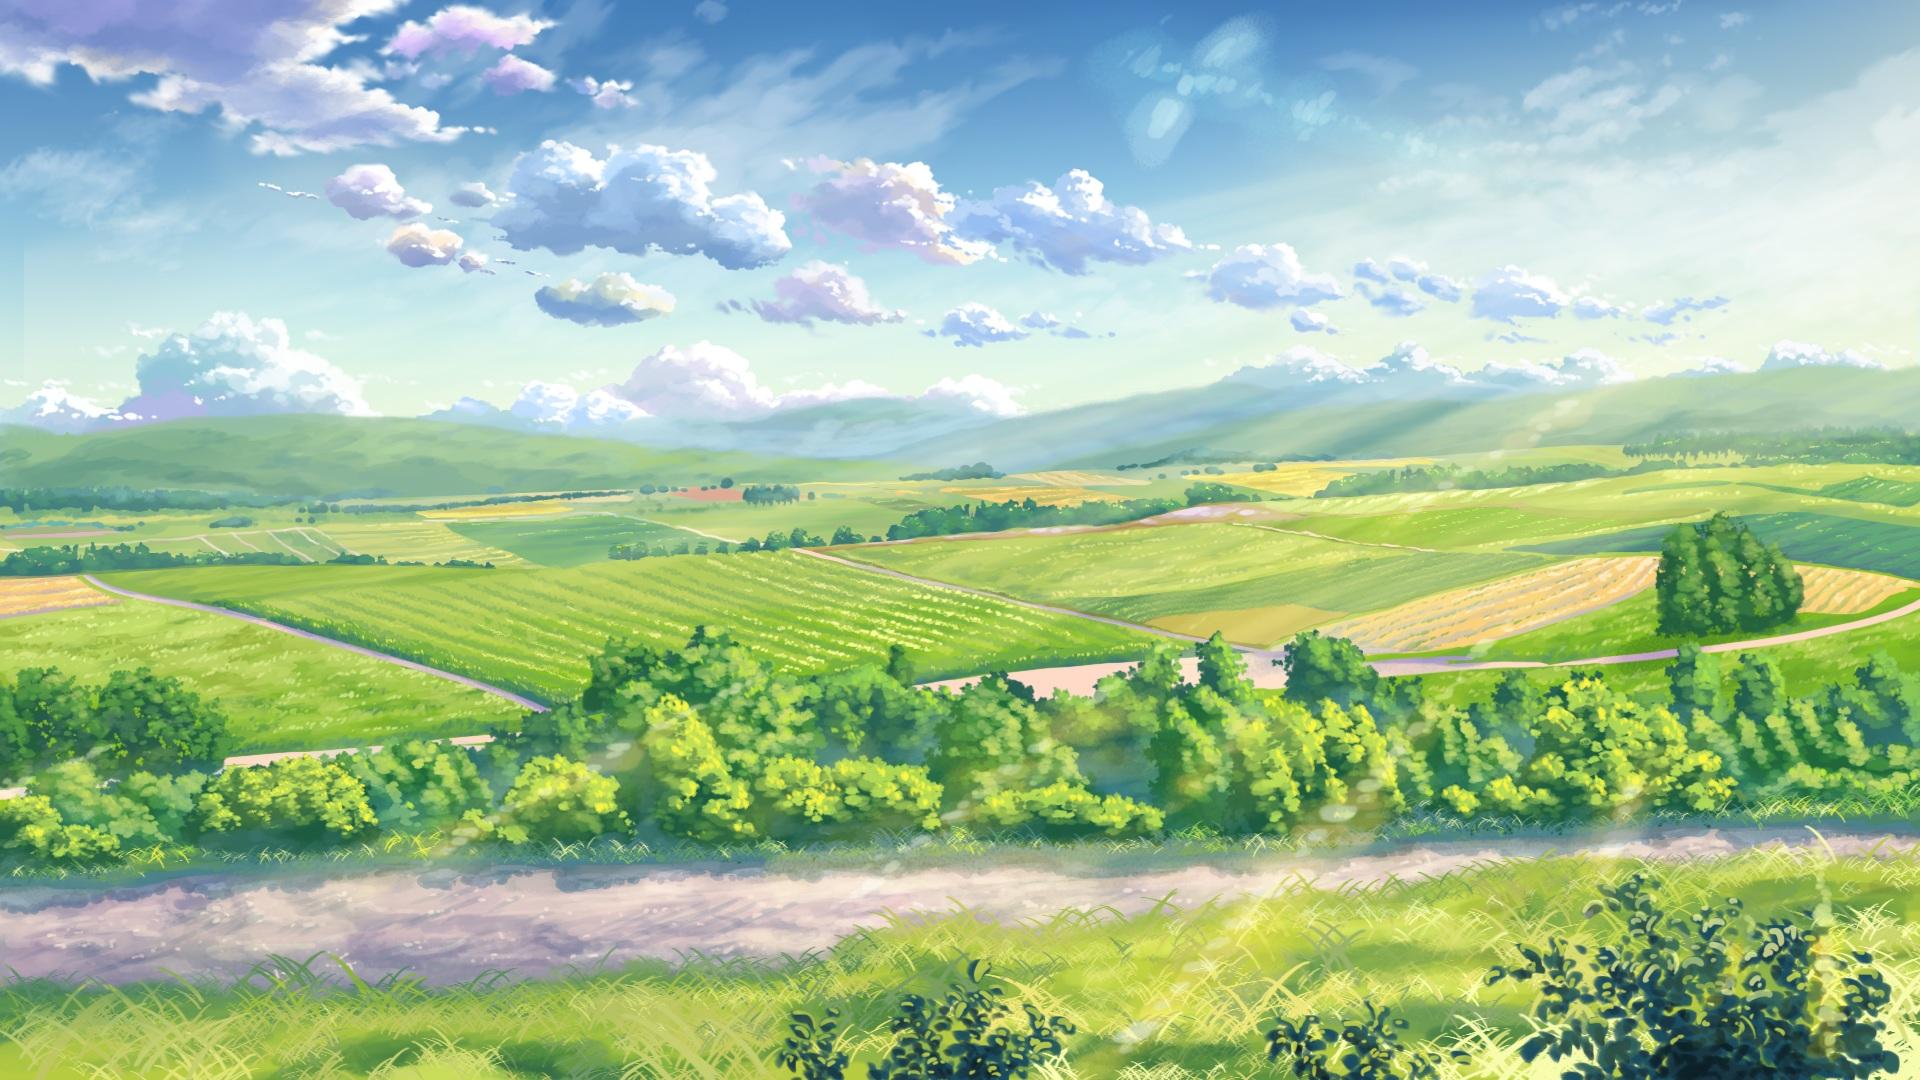 Green Anime Landscape HD Wallpaper | 1920x1080 | ID:55875